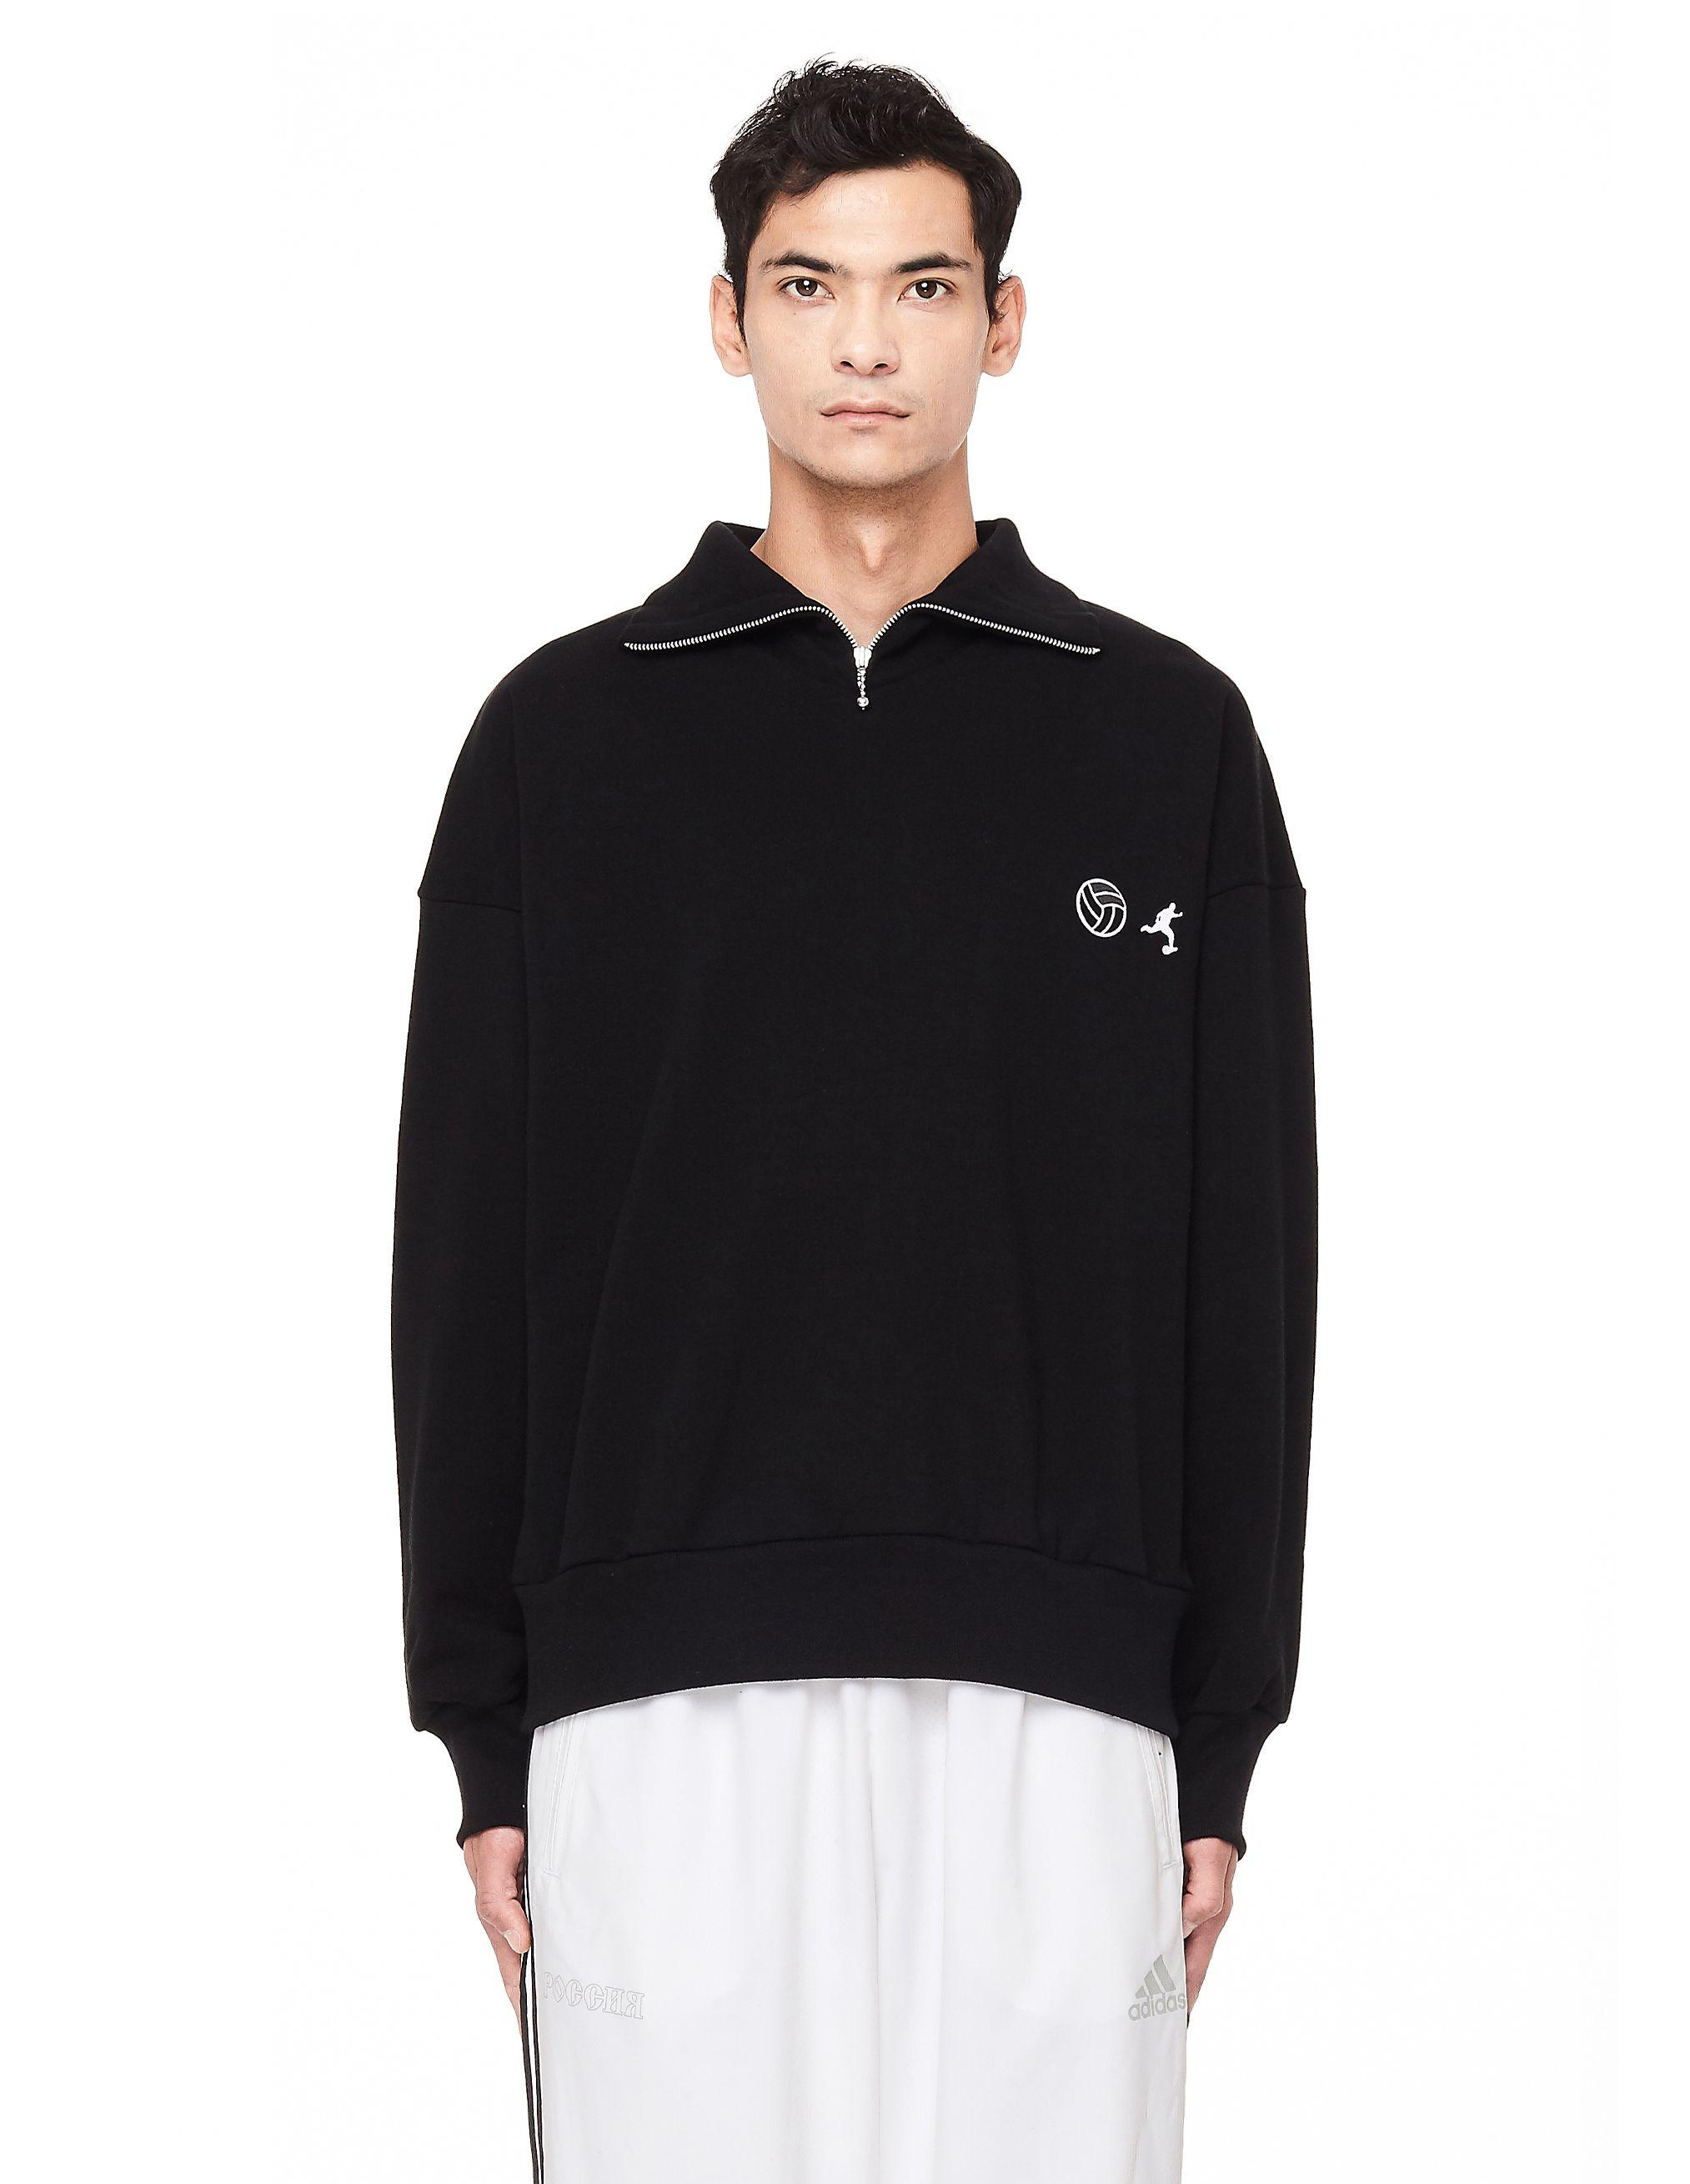 Gosha Rubchinskiy Black Zip Collar Sweatshirt Modesens Collared Sweatshirt Zip Collar Sweatshirts [ 2620 x 2027 Pixel ]